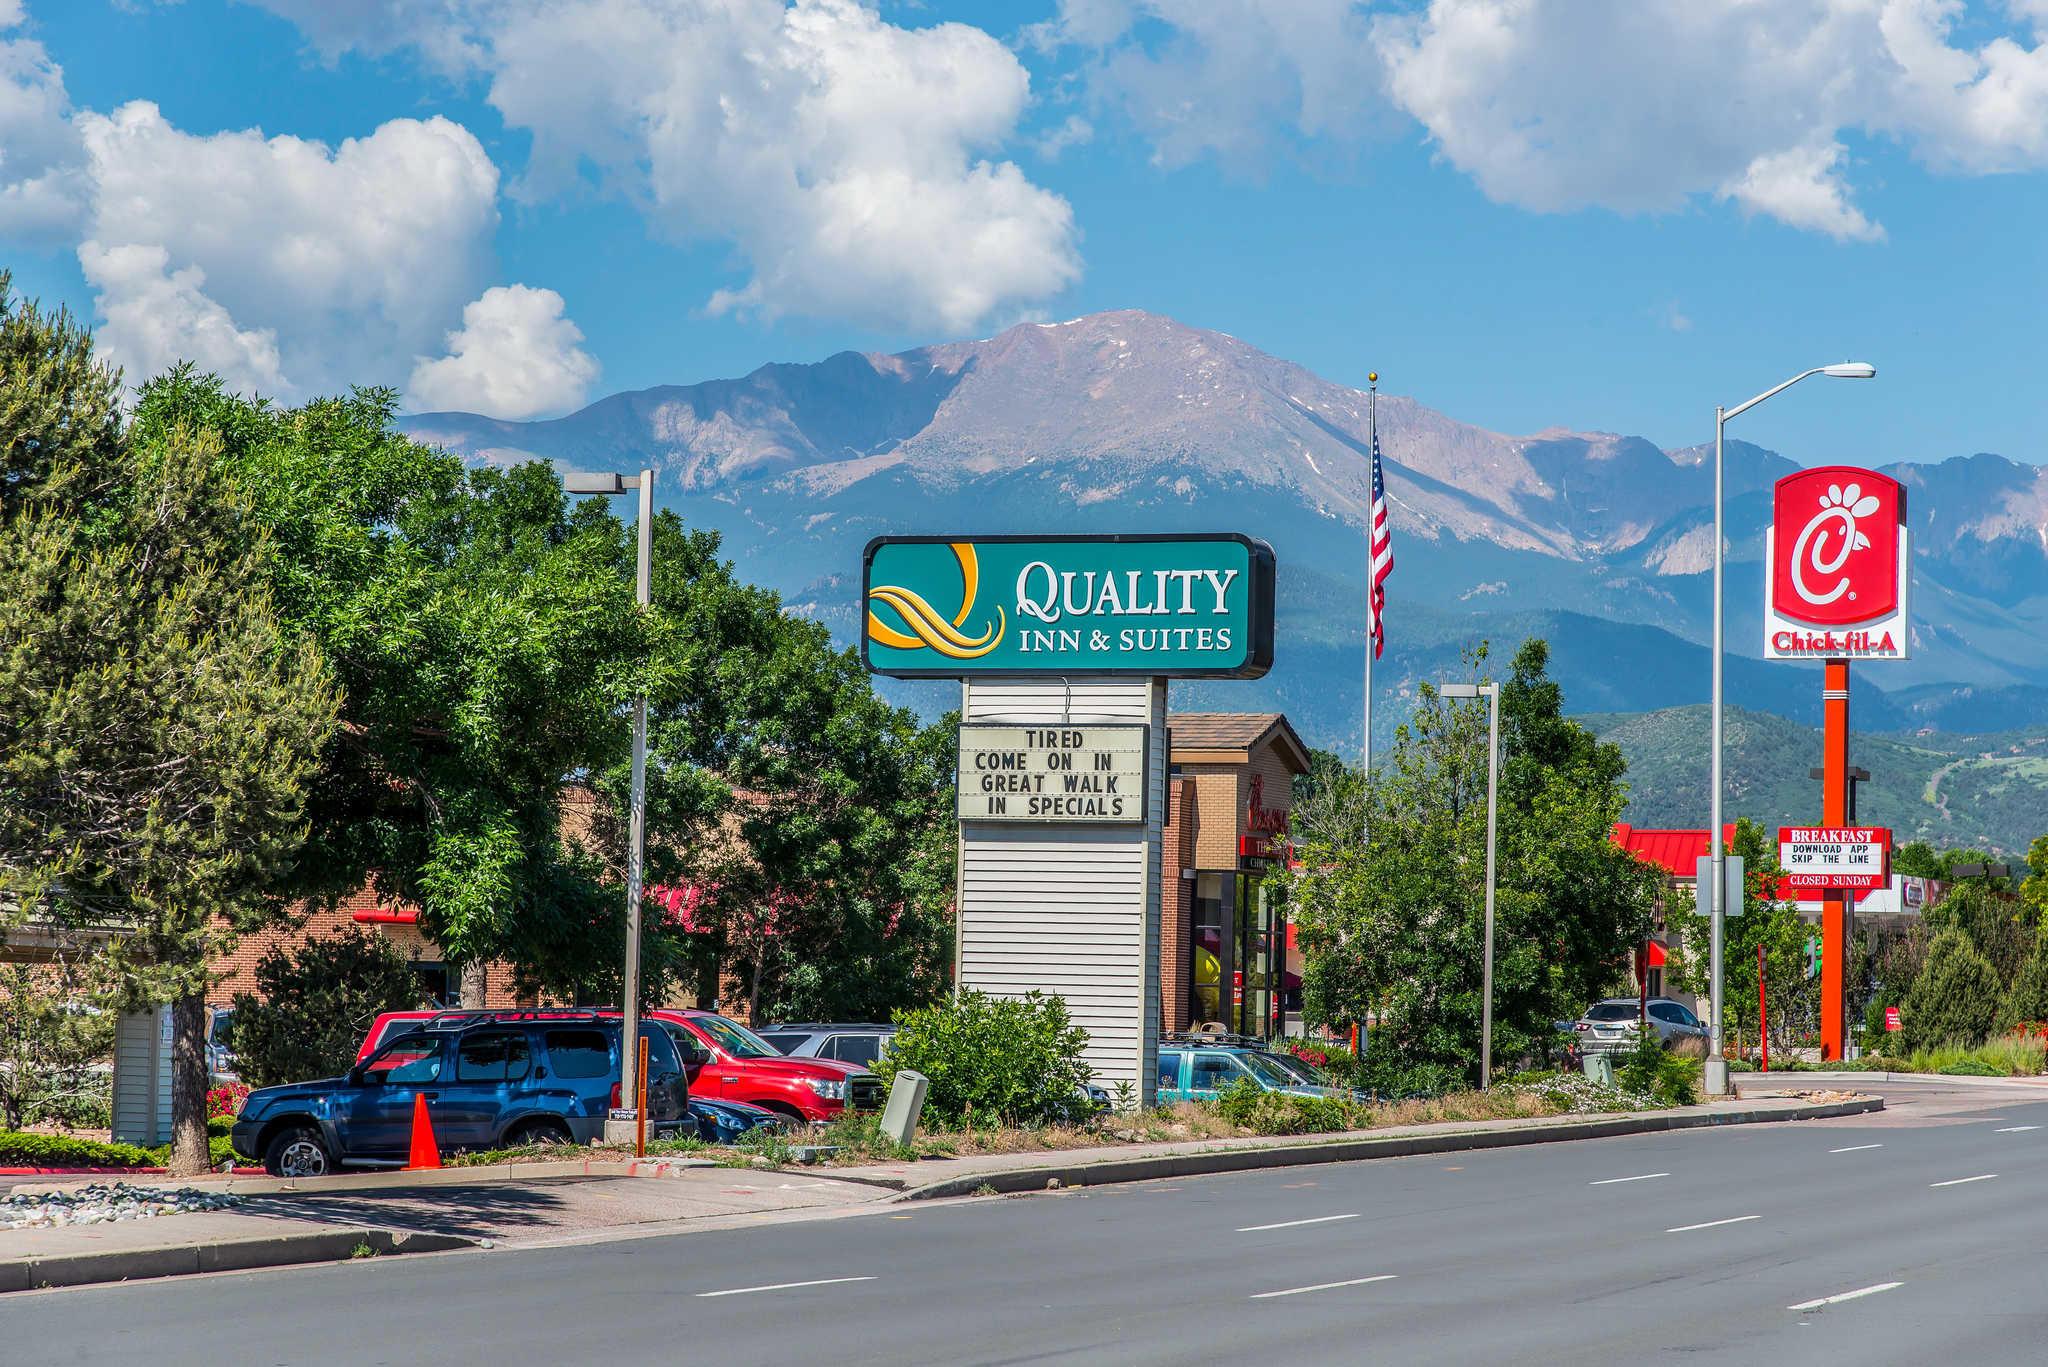 Quality Inn Suites Garden Of The Gods Colorado Springs Colorado Co